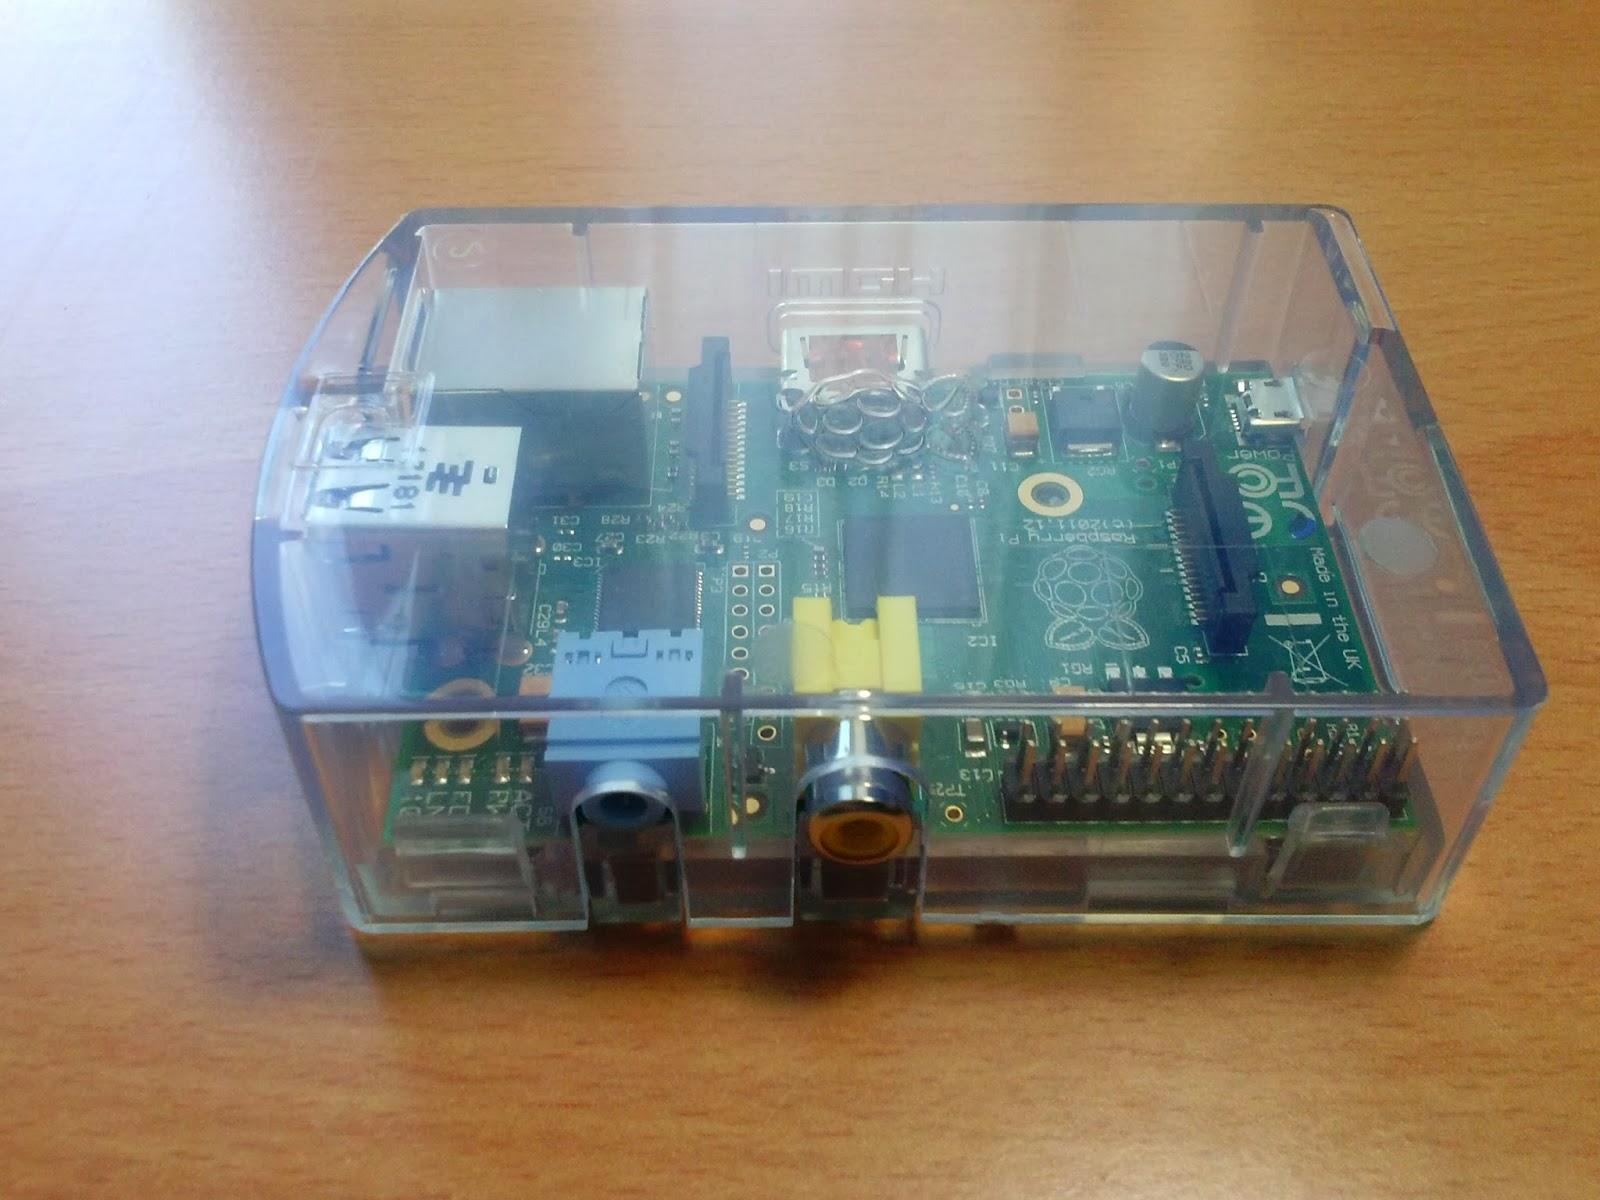 Raspberry + Owncloud + Transmission = ¡Archivos para todos!